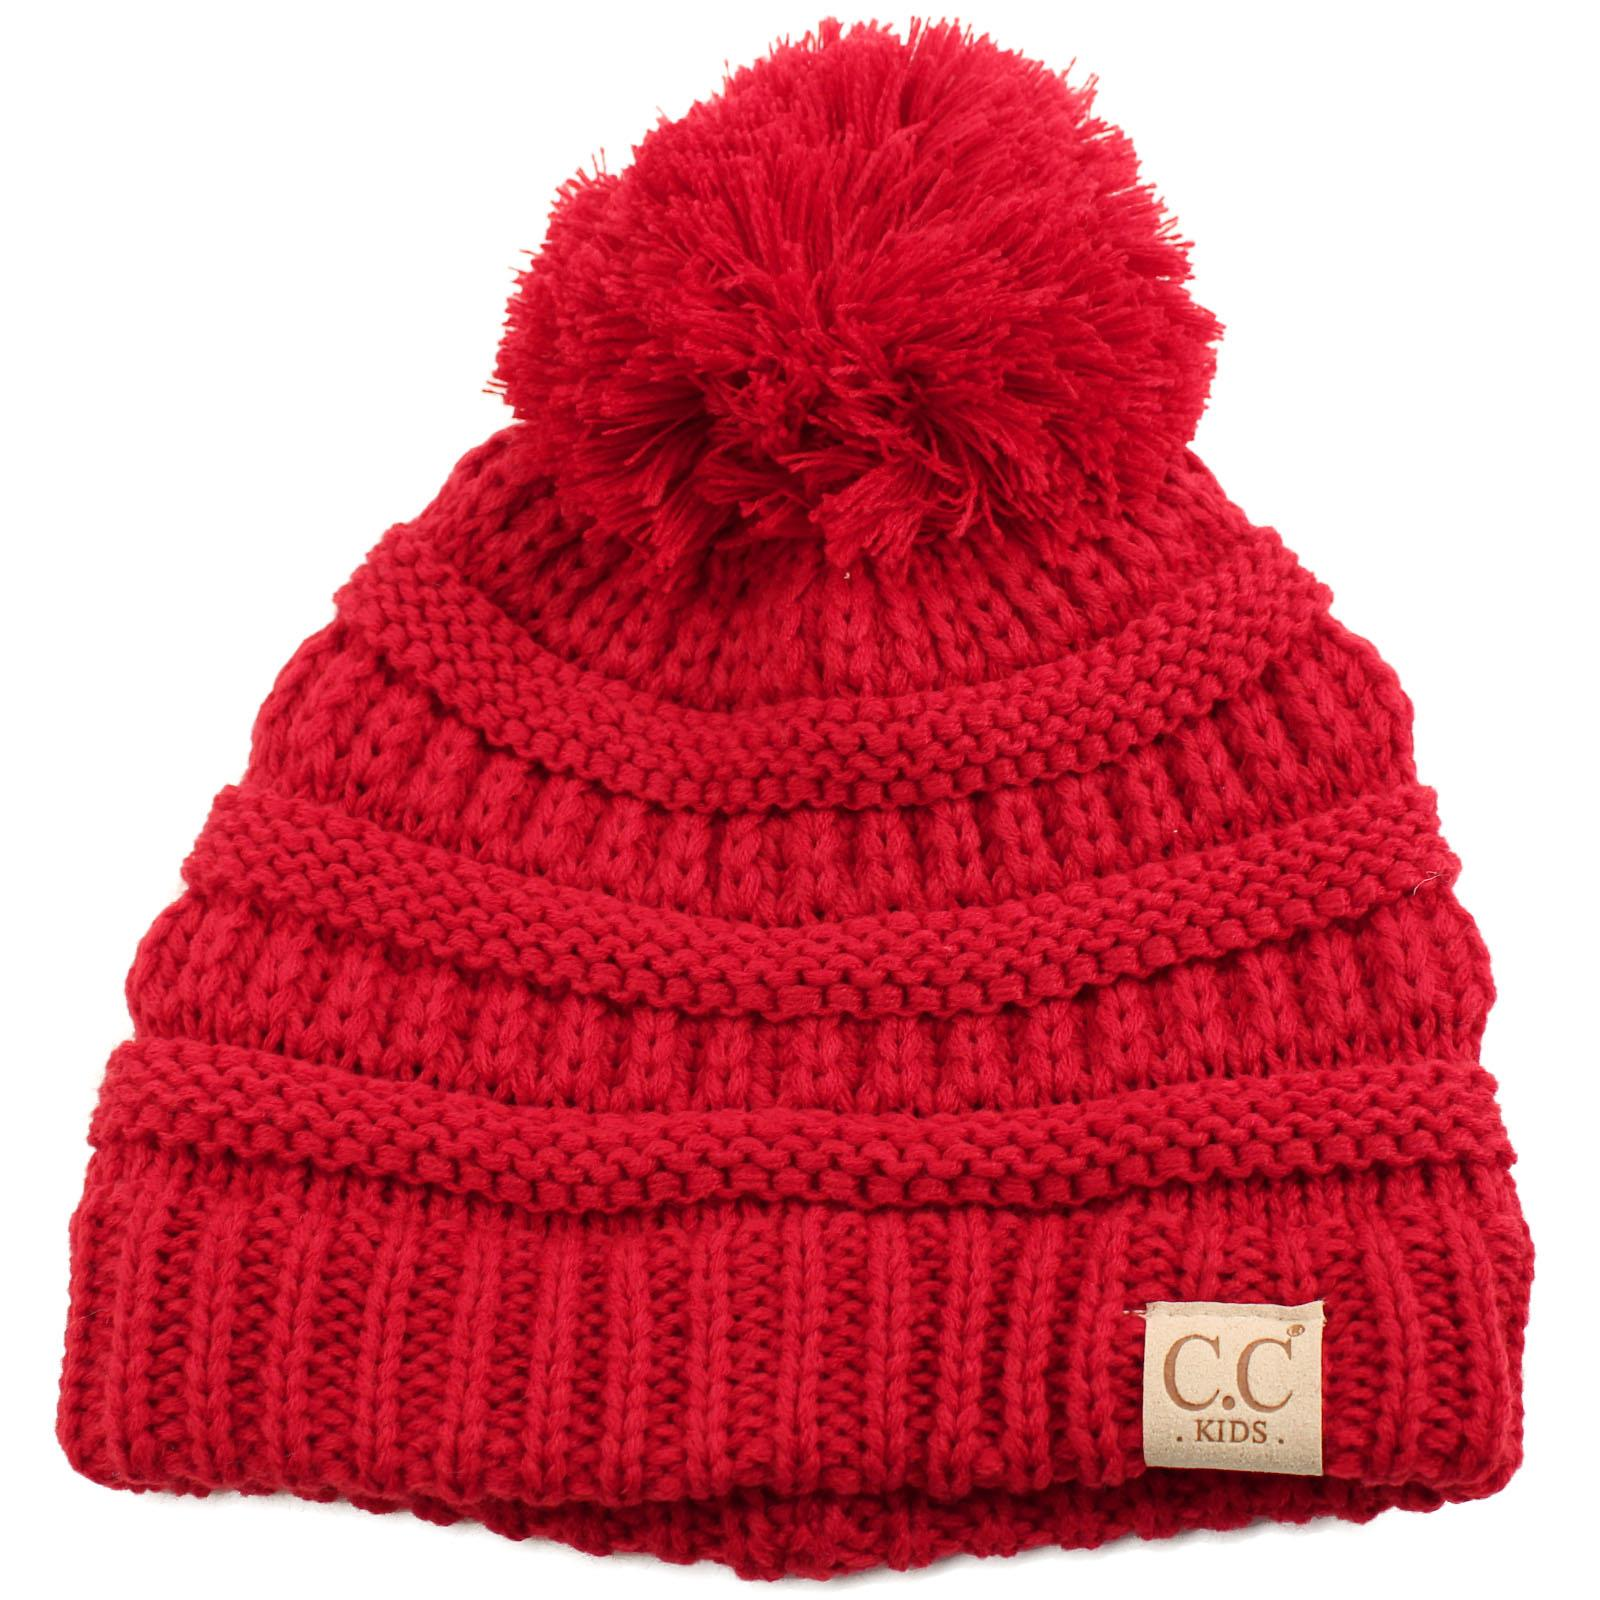 Kids CC Ages 2-7 Pom Pom Ears Chunky Thick Stretchy Knit Soft Beanie Hat